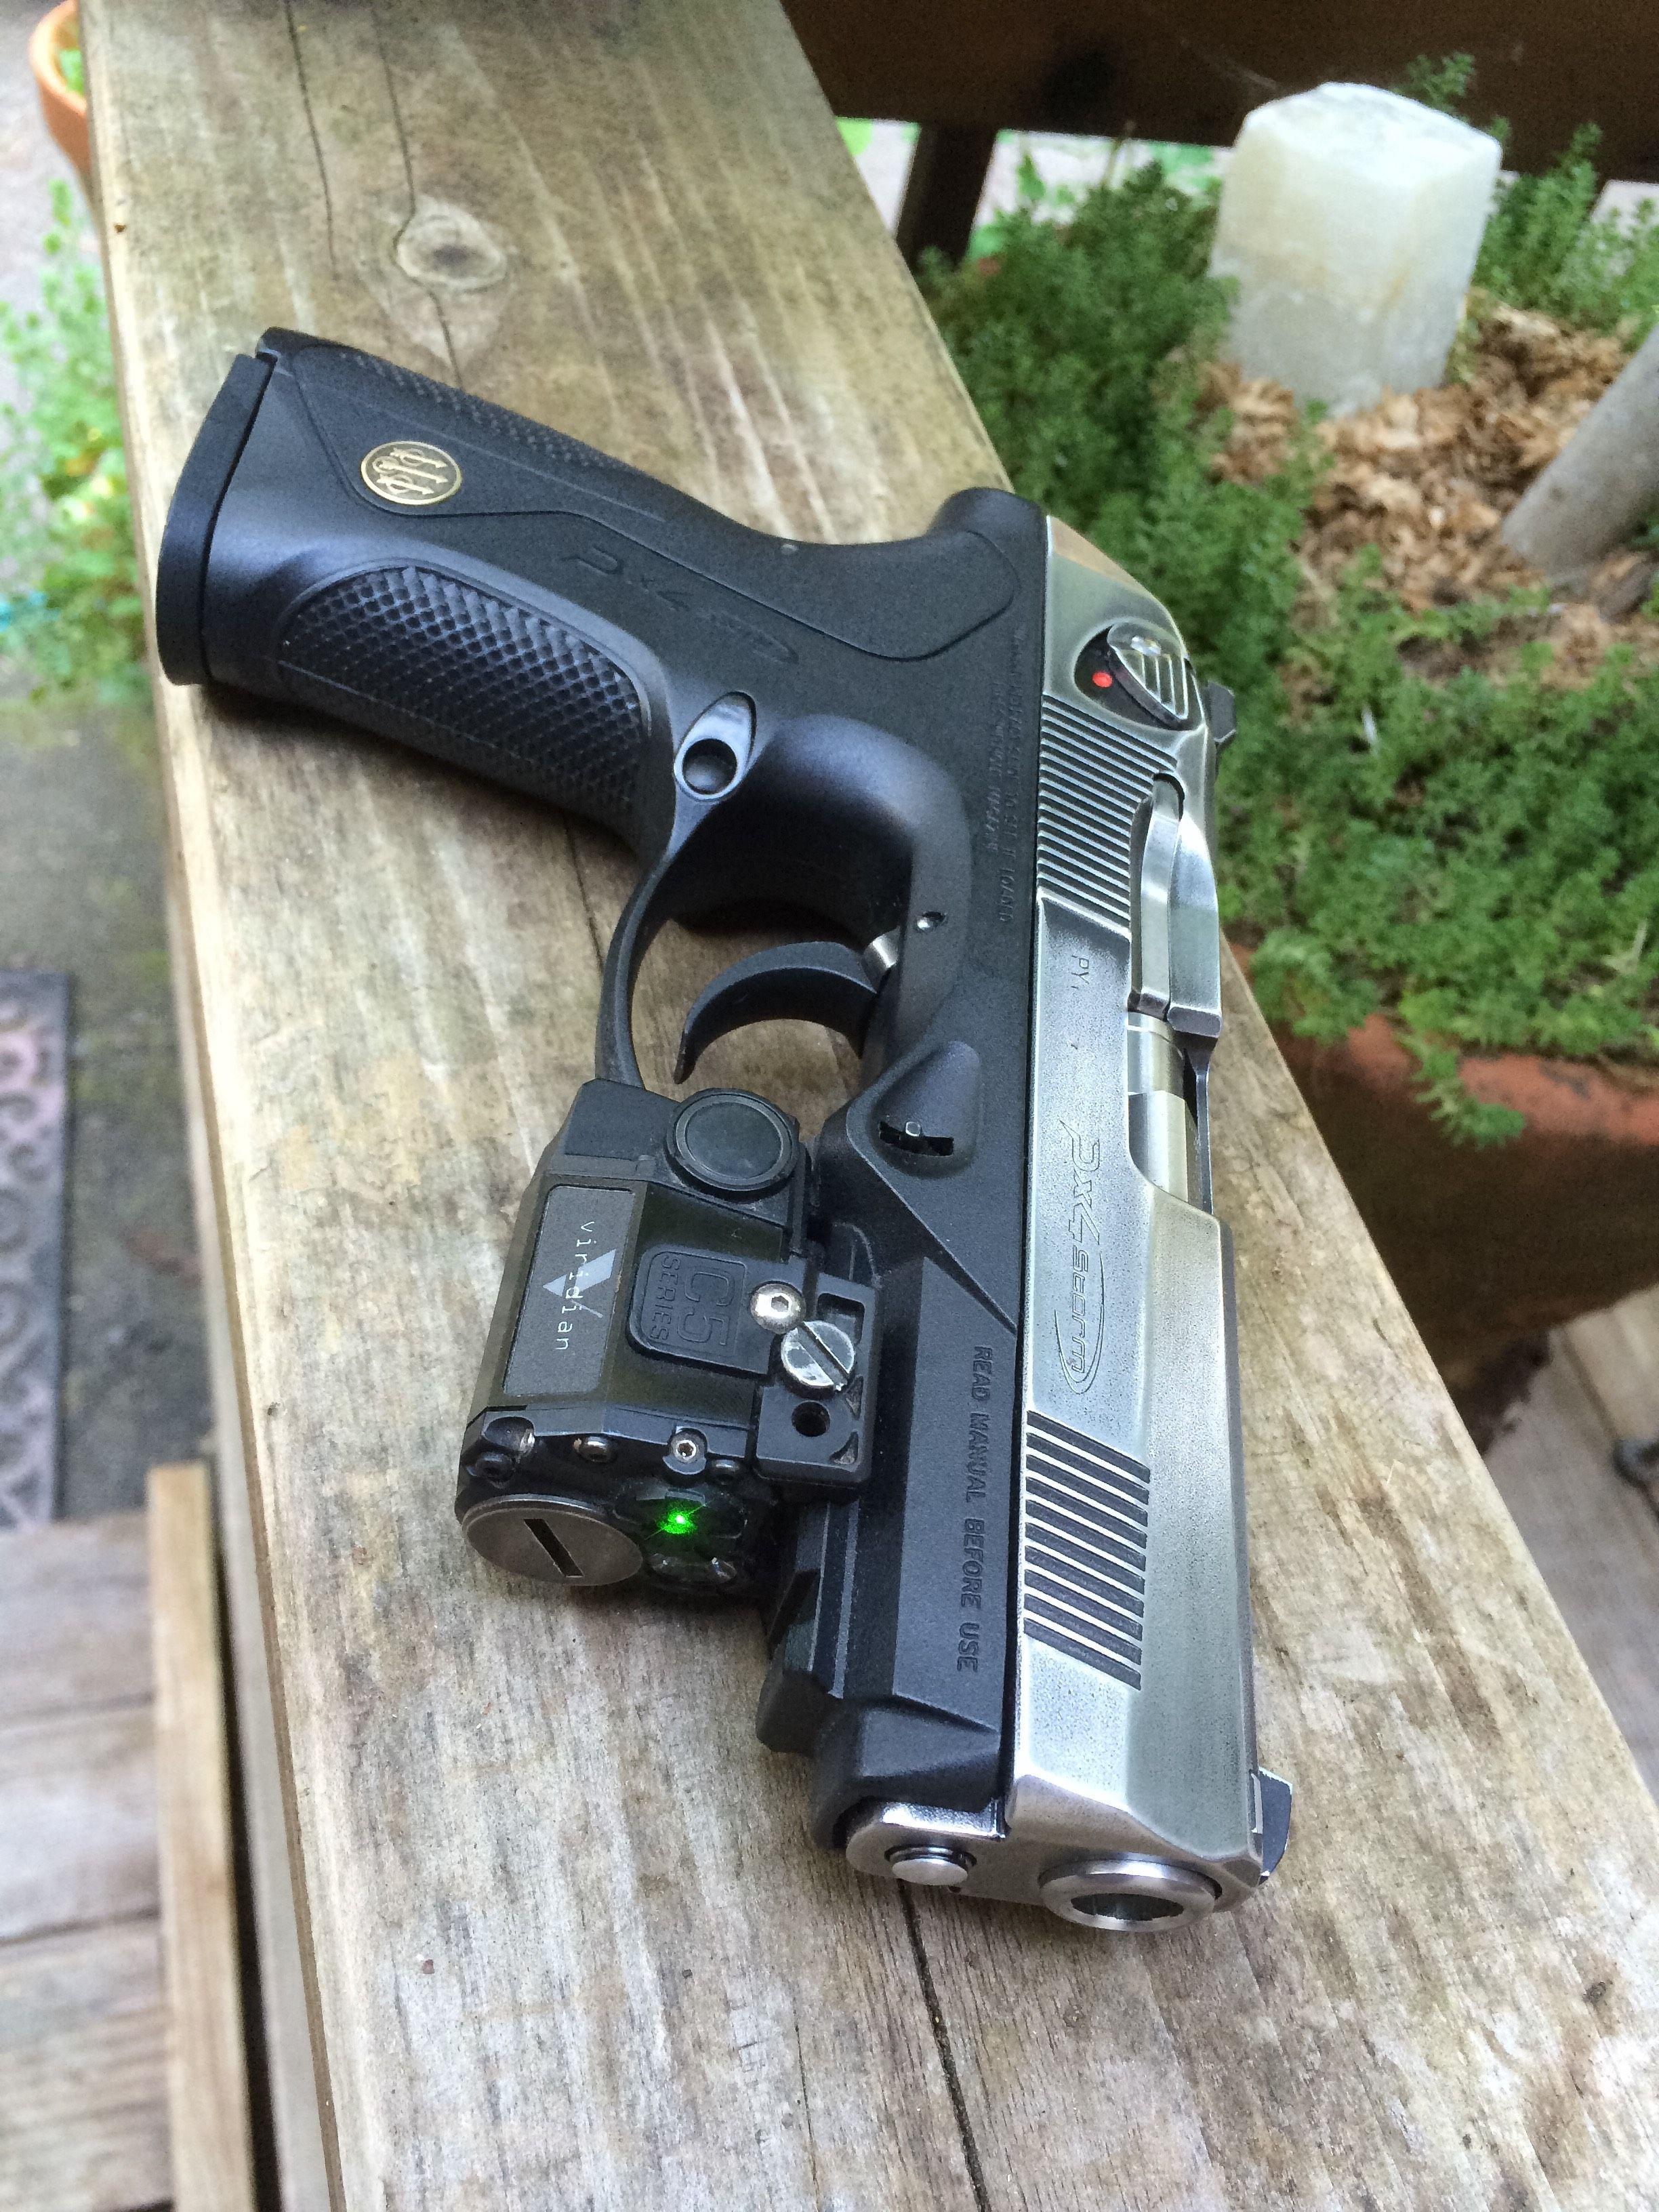 Beretta PX4 Storm with Viridian C5L green laser sight